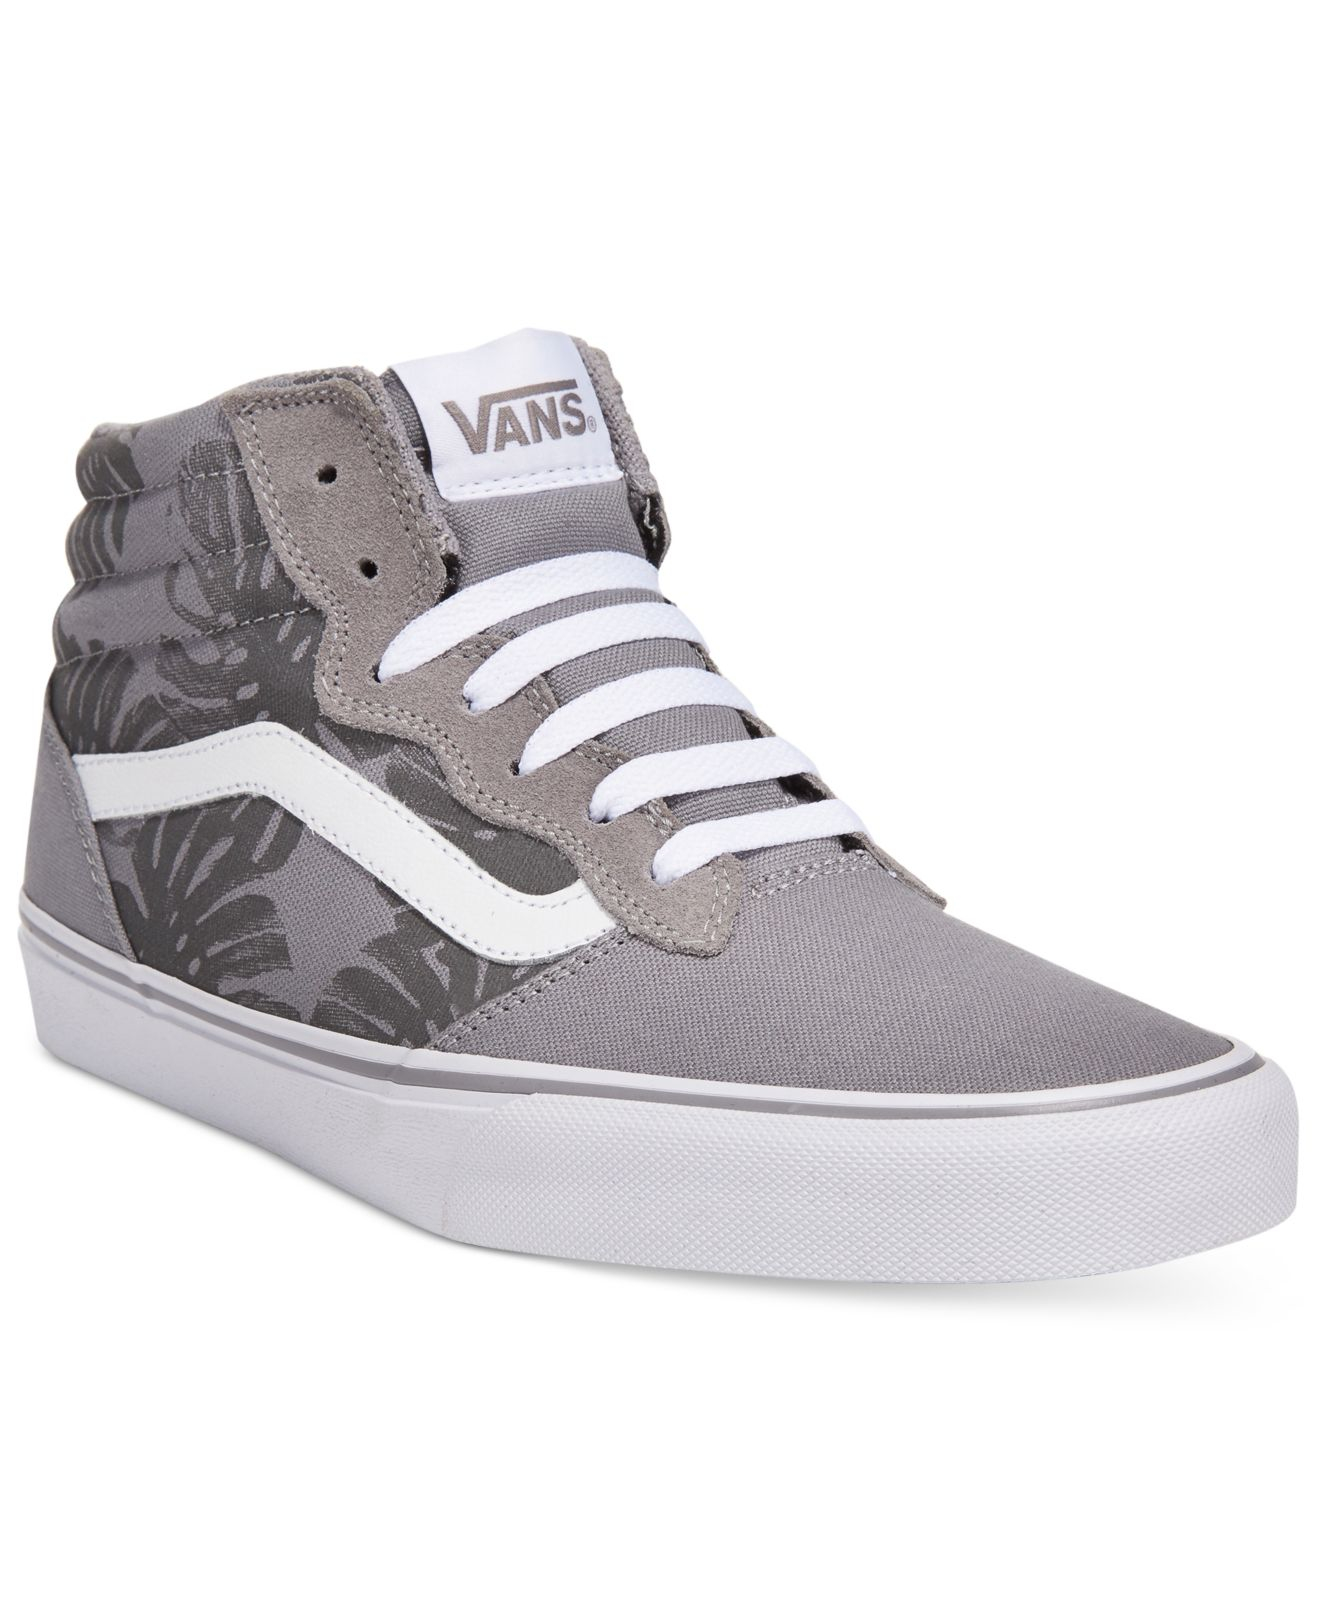 vans men 39 s milton hi top floral sneakers in gray for men grey lyst. Black Bedroom Furniture Sets. Home Design Ideas